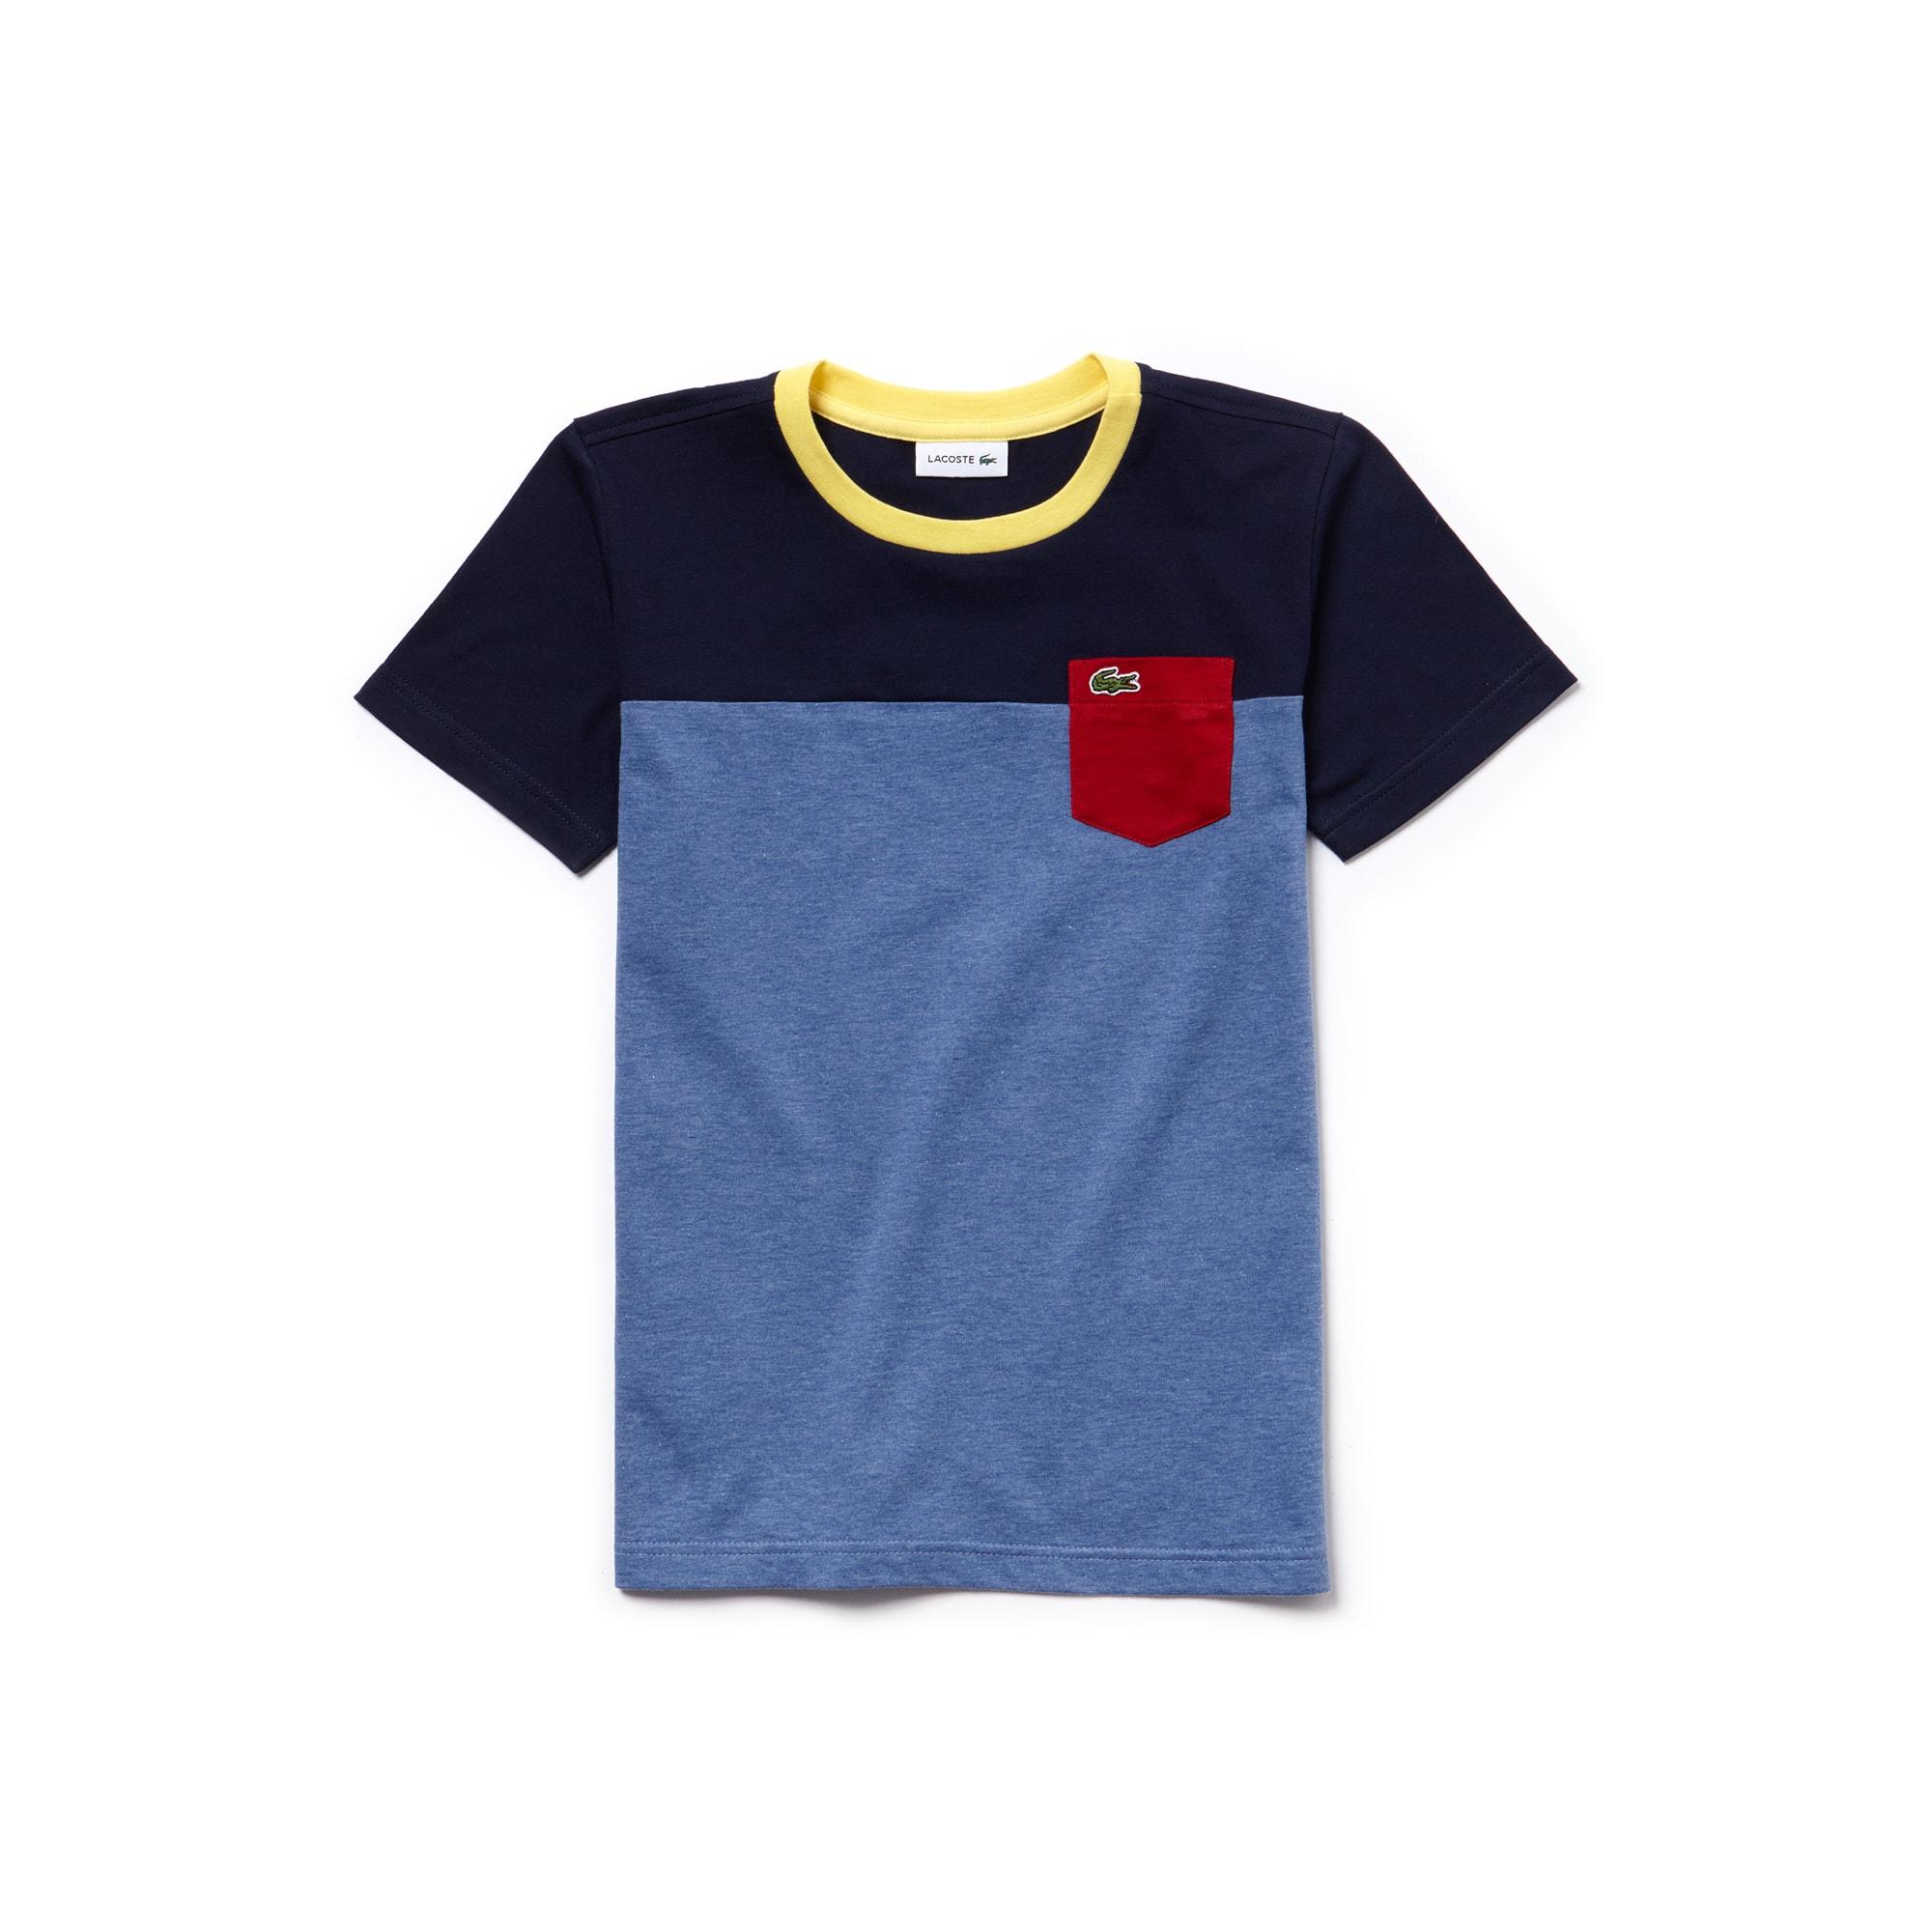 Boys Lacoste T Shirt